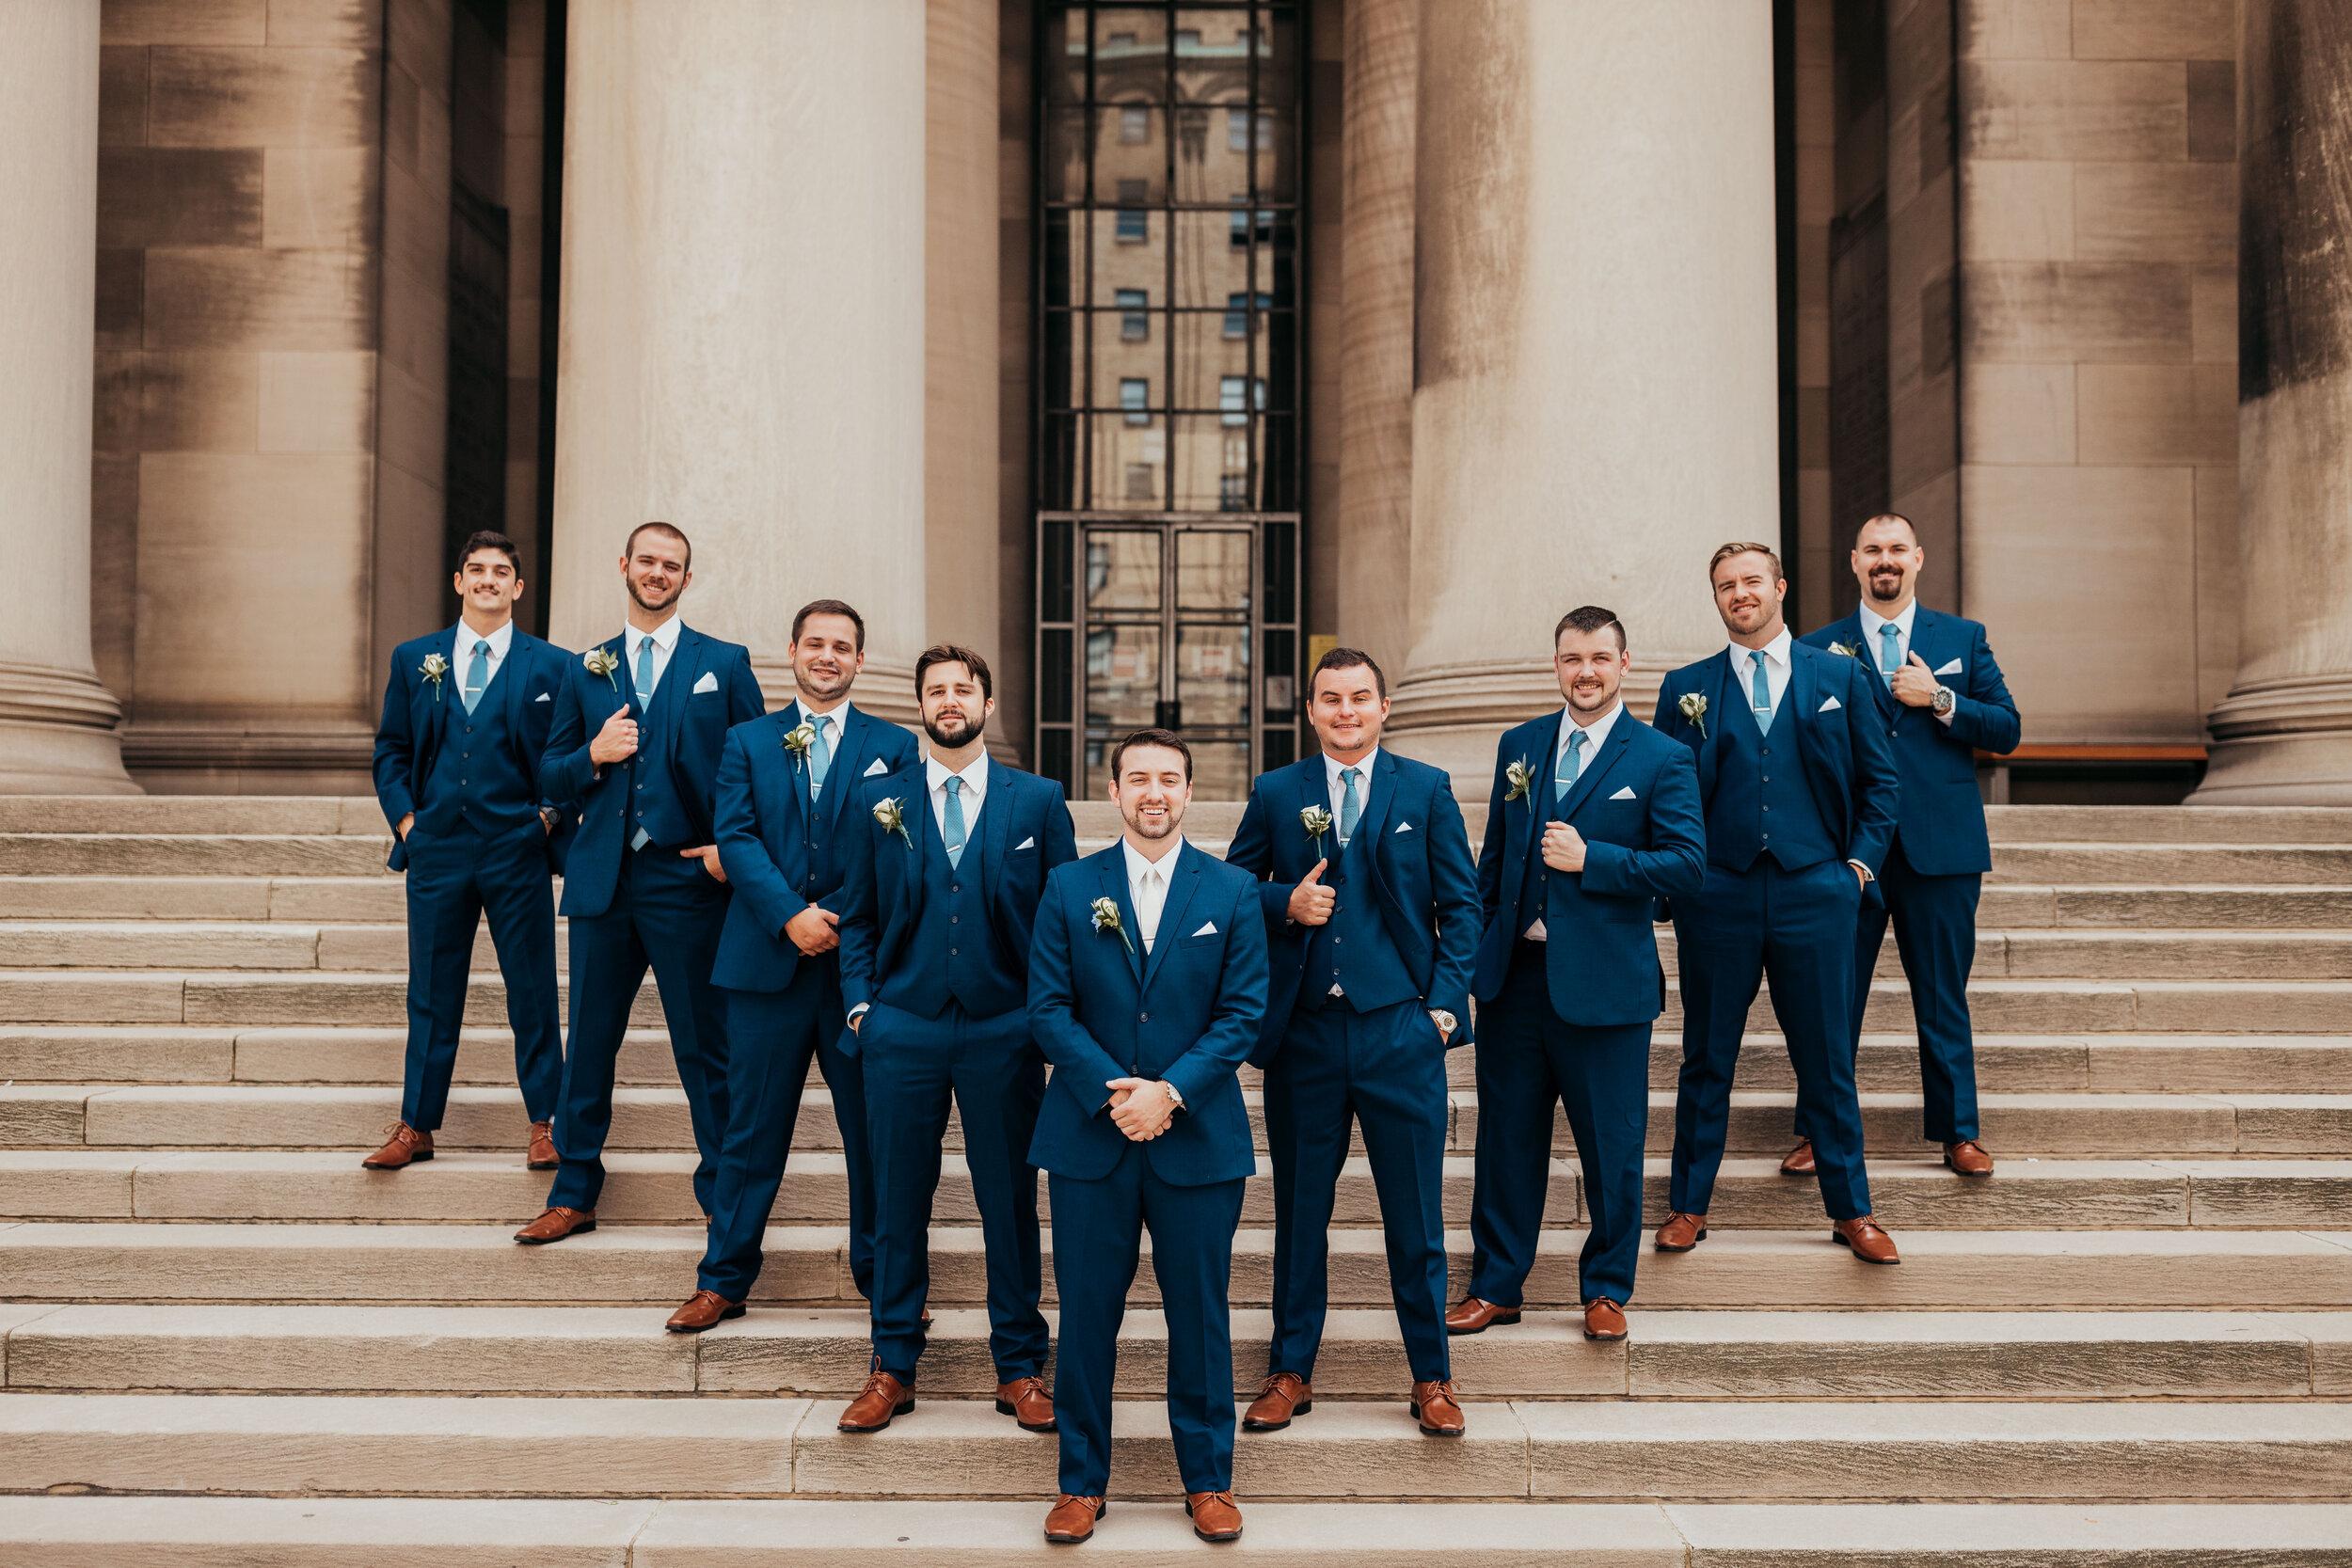 Pittsburgh wedding photography - Hartwood Acres Mansion wedding-443.jpg